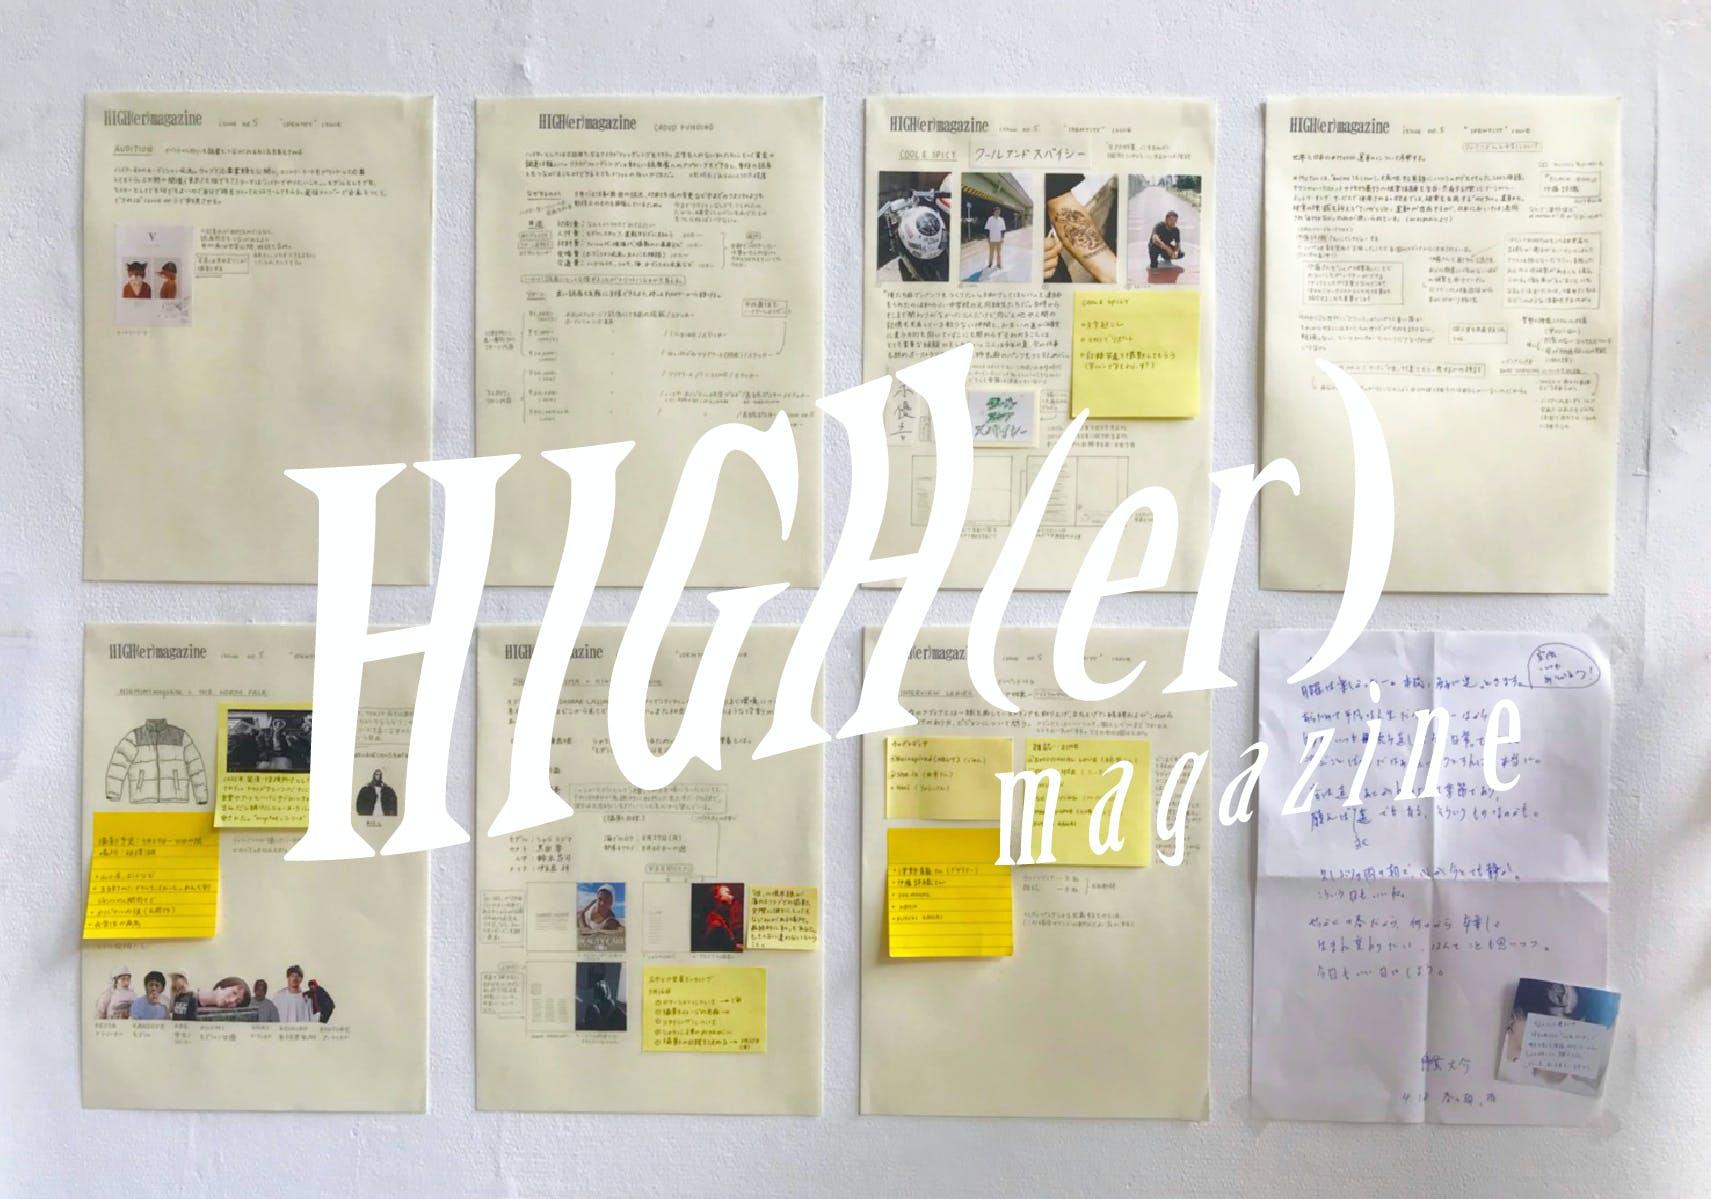 【HIGH(er)magazine】5号目の刊行&地方でのイベント開催に向けて